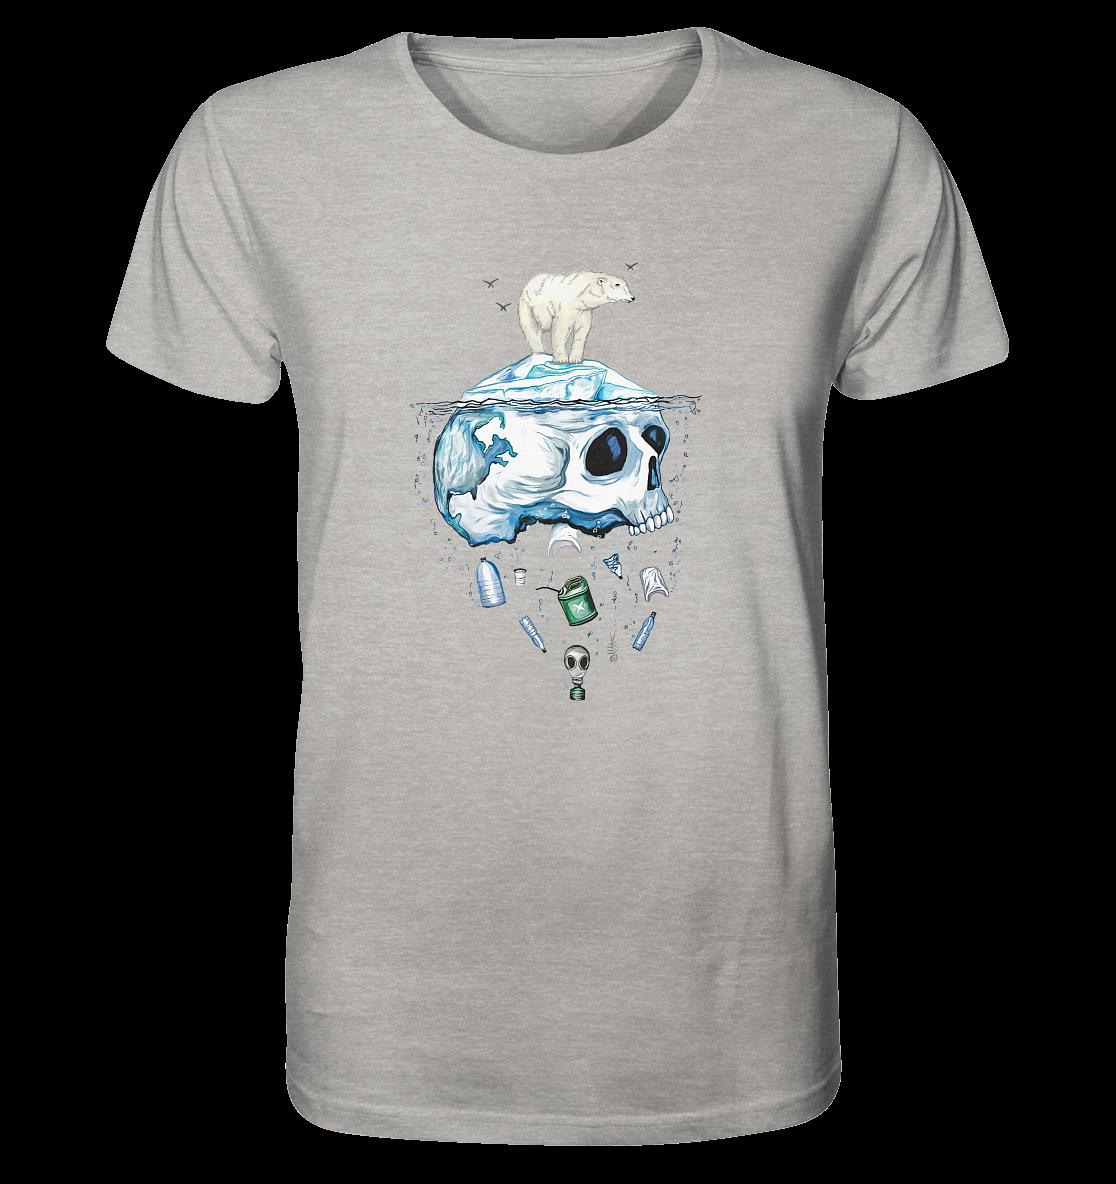 front-organic-shirt-meliert-c2c1c0-1116x.png